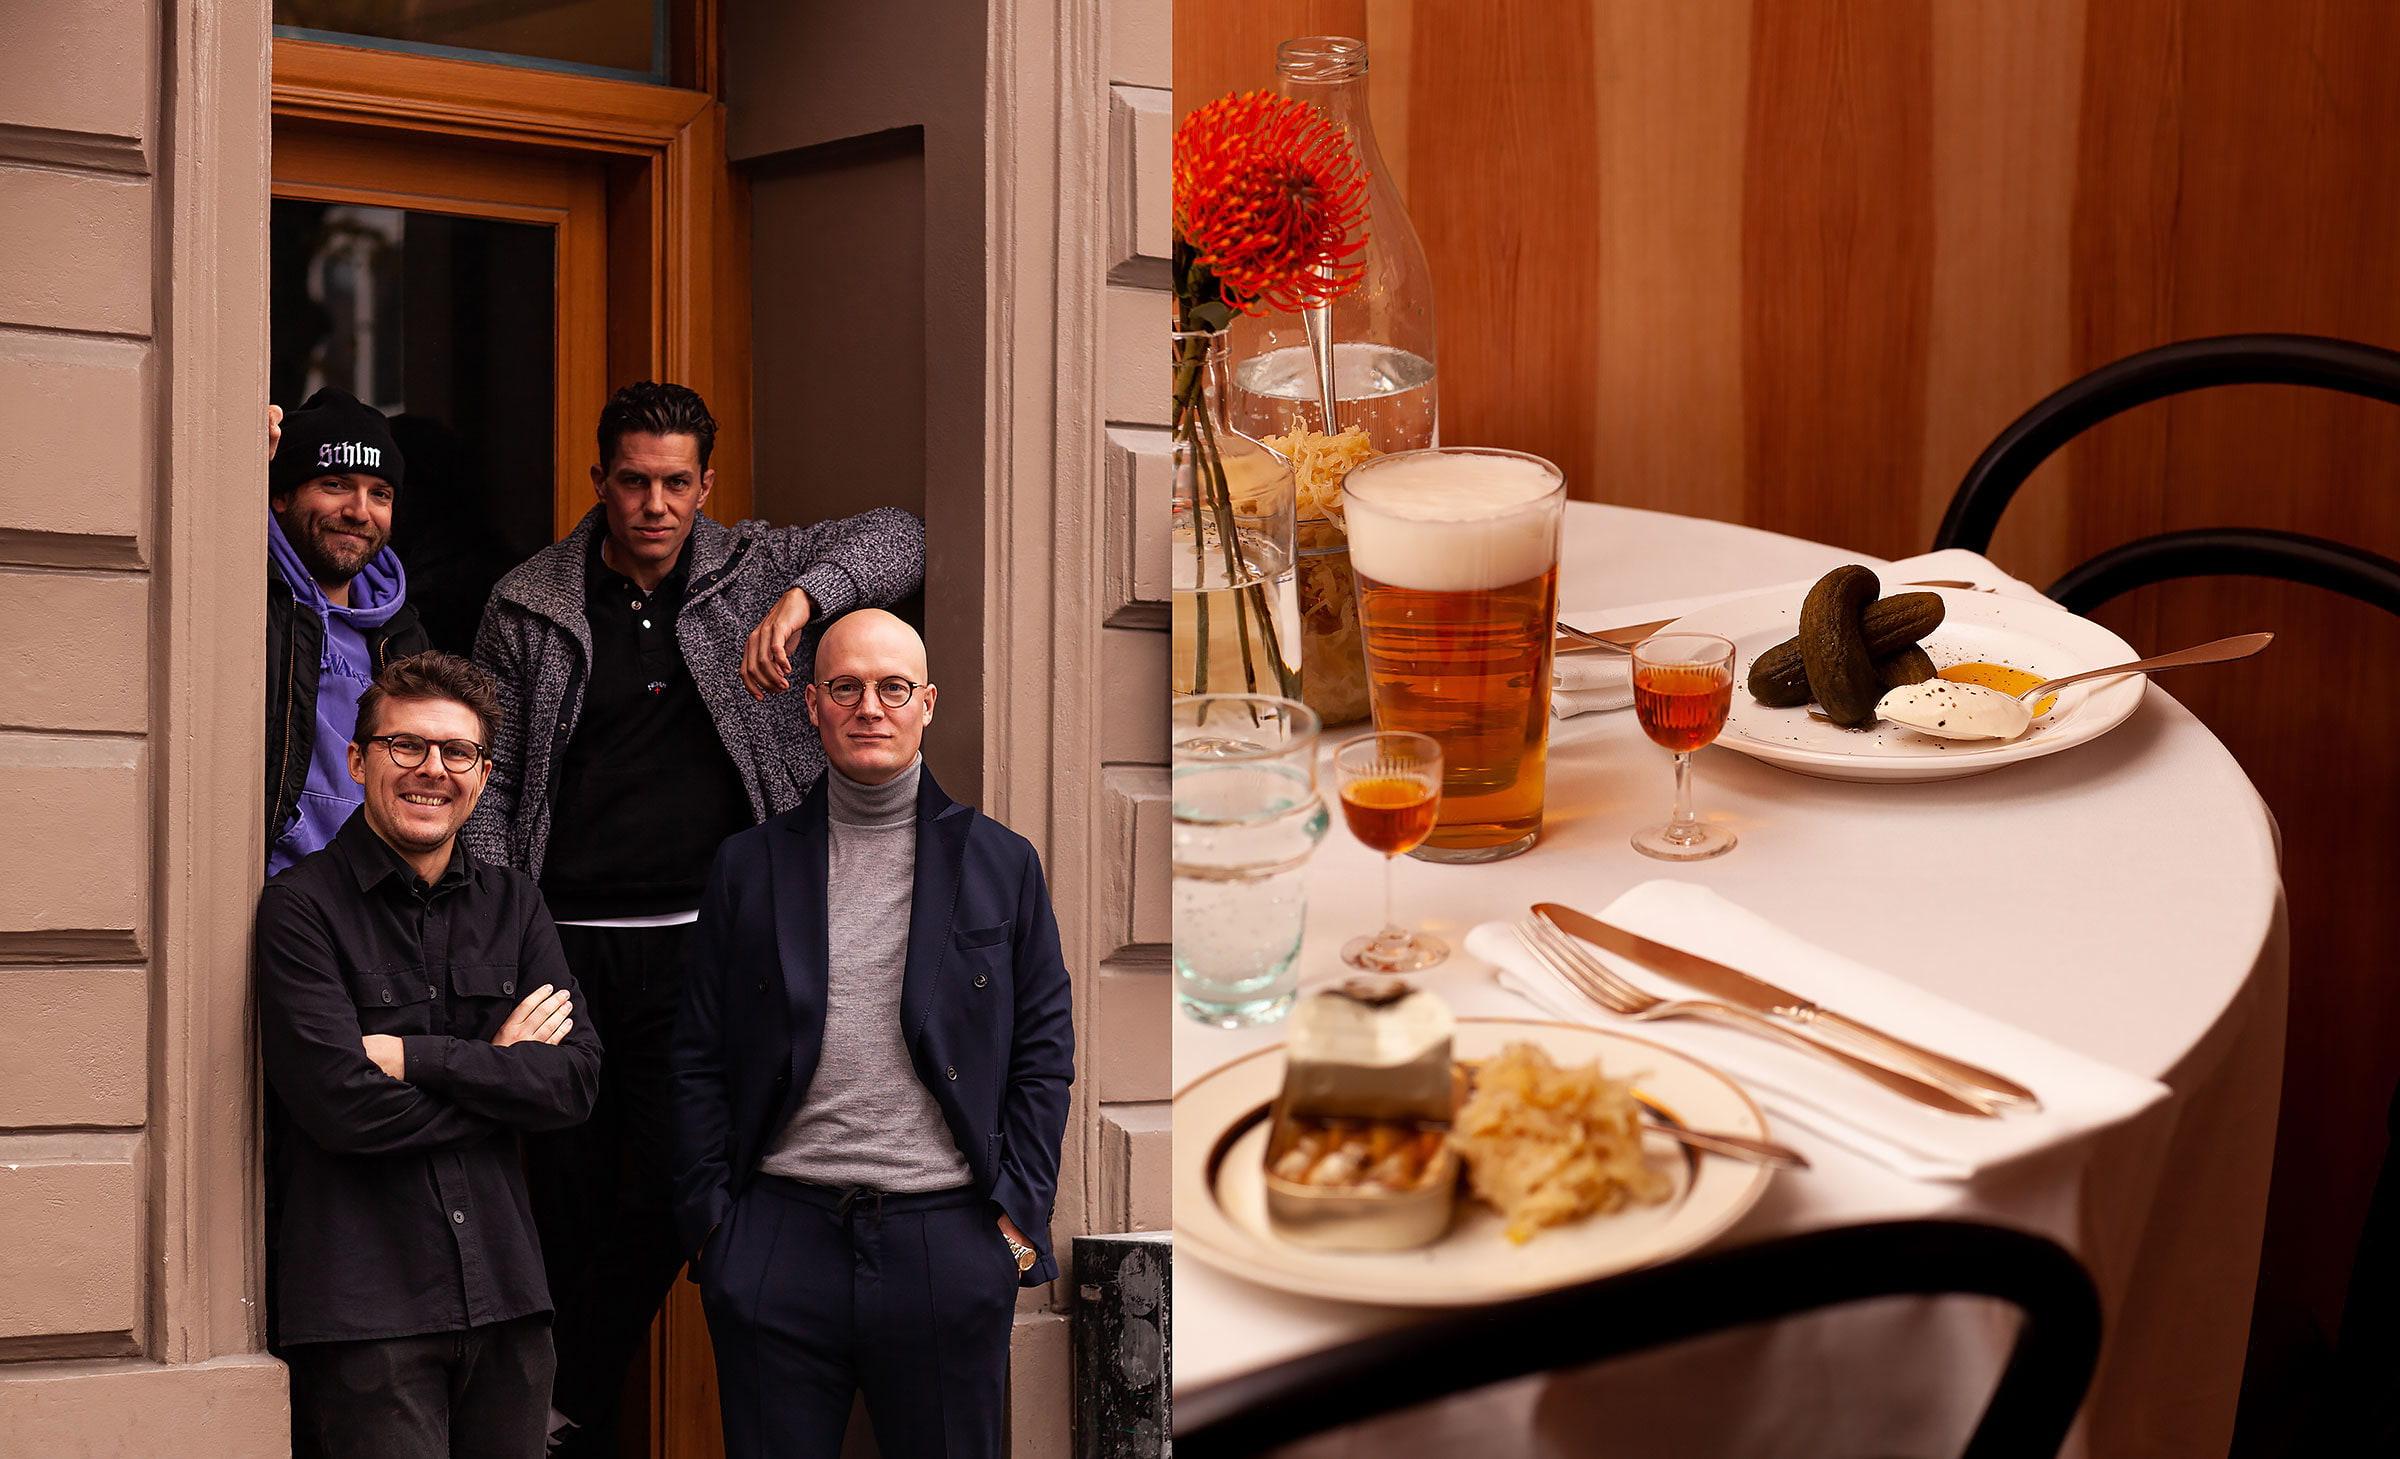 Paradisos matsal blir tyska bistron Liebling